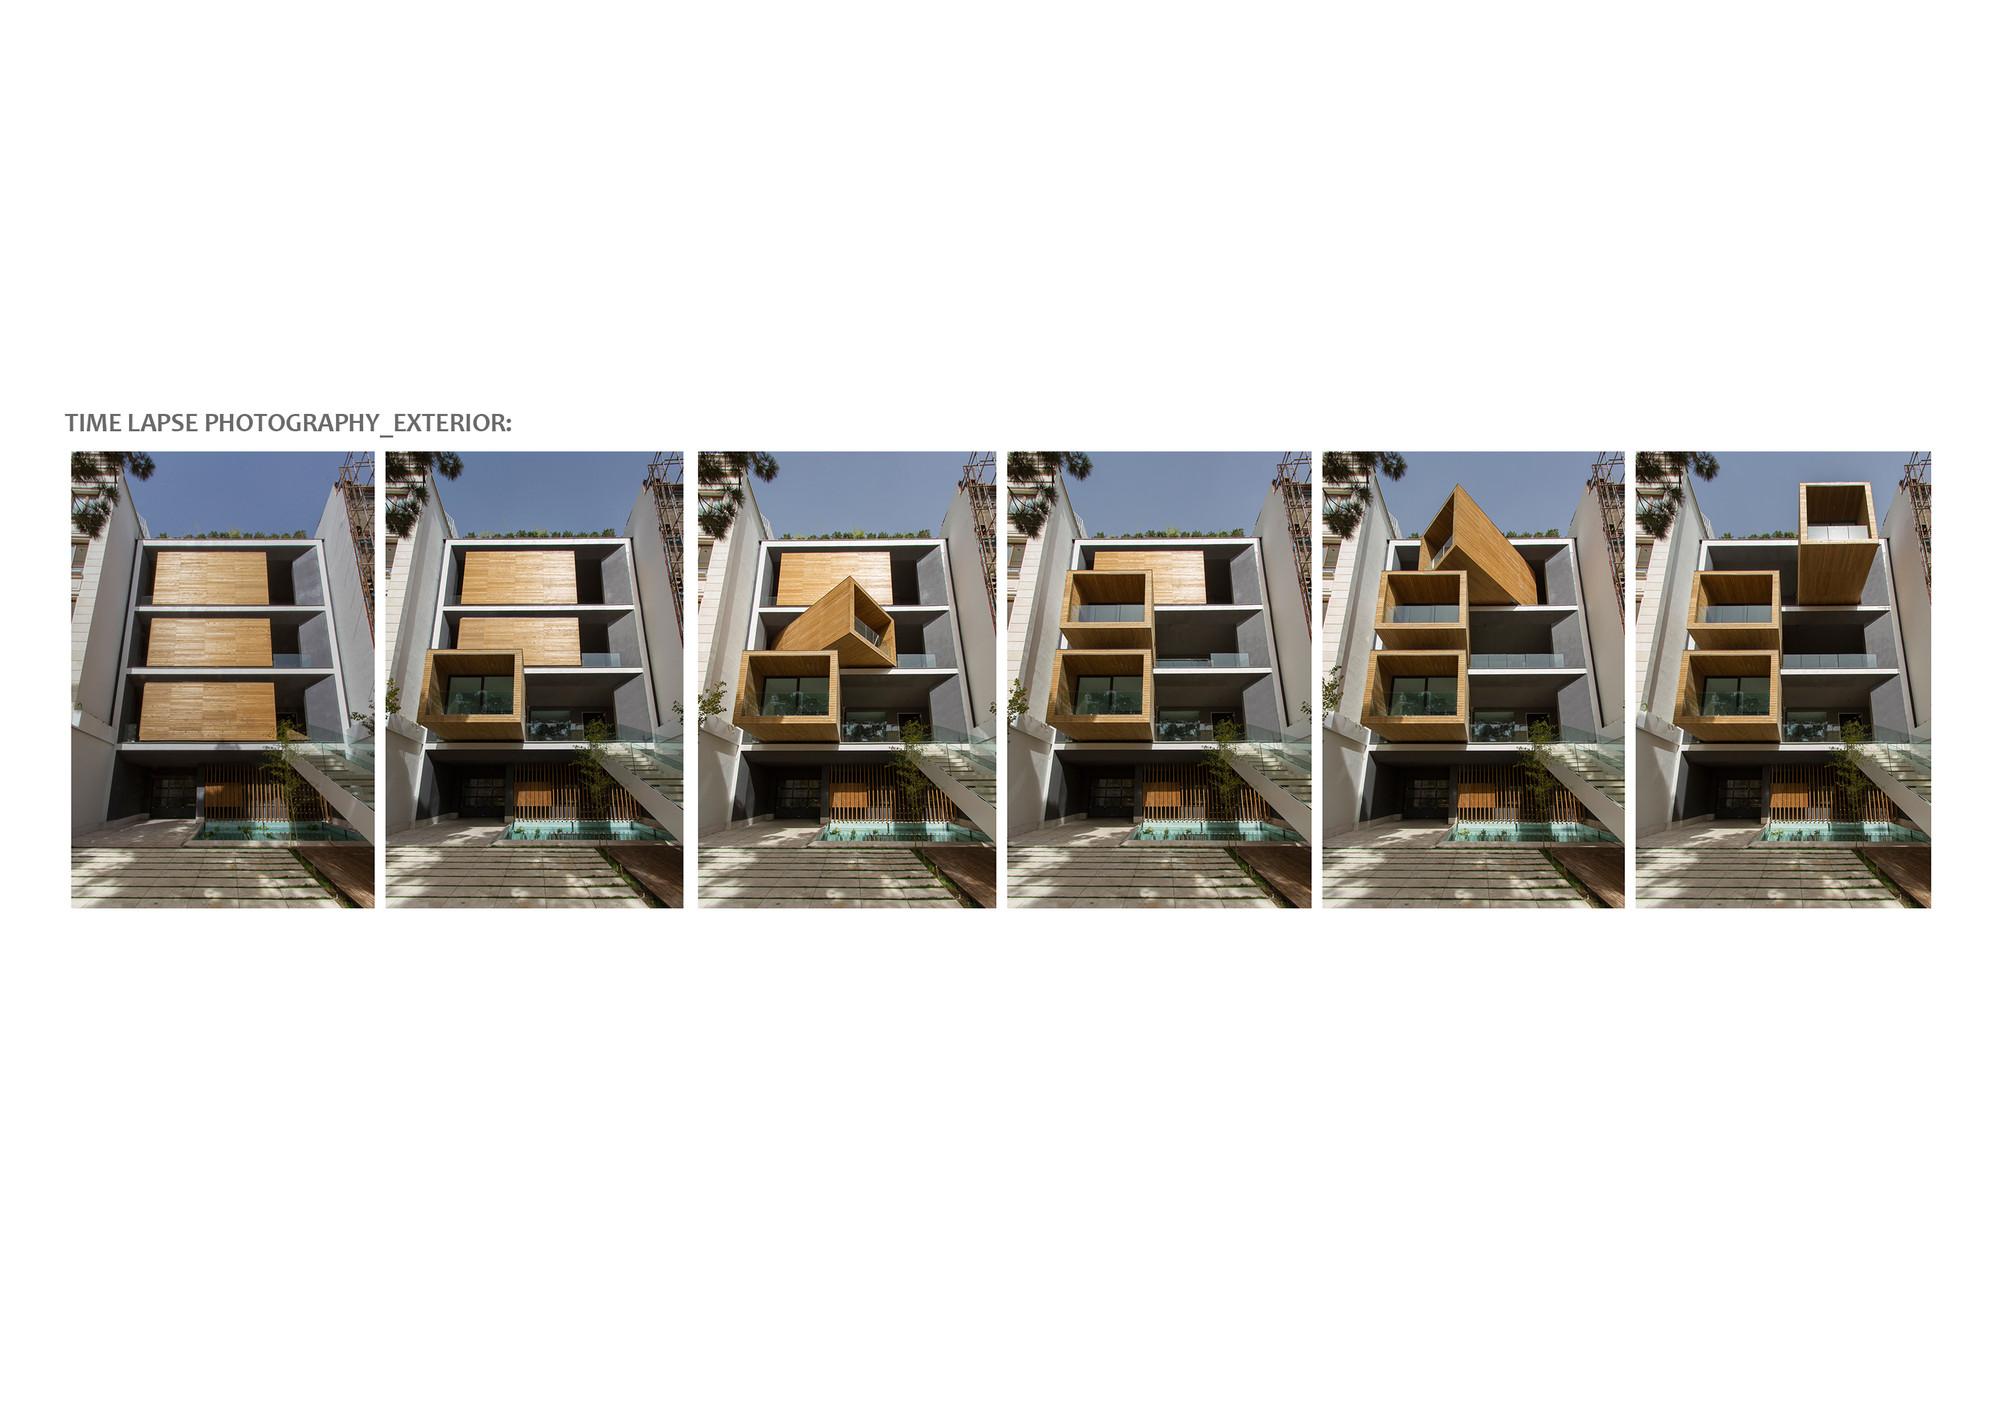 Exterior Timelapse Photographs